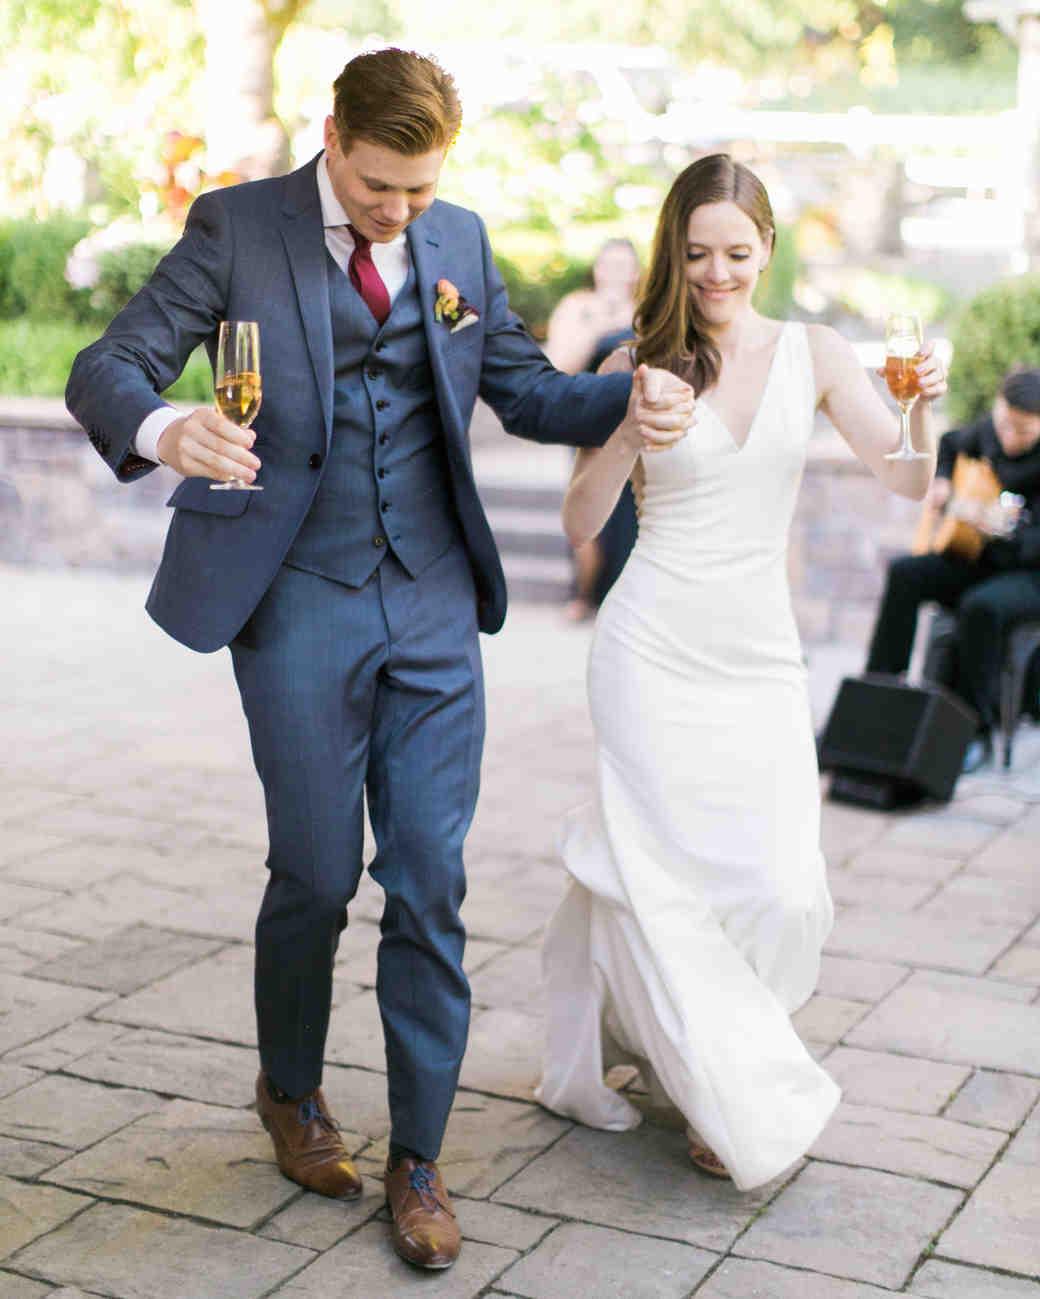 paige matt wedding couple walking